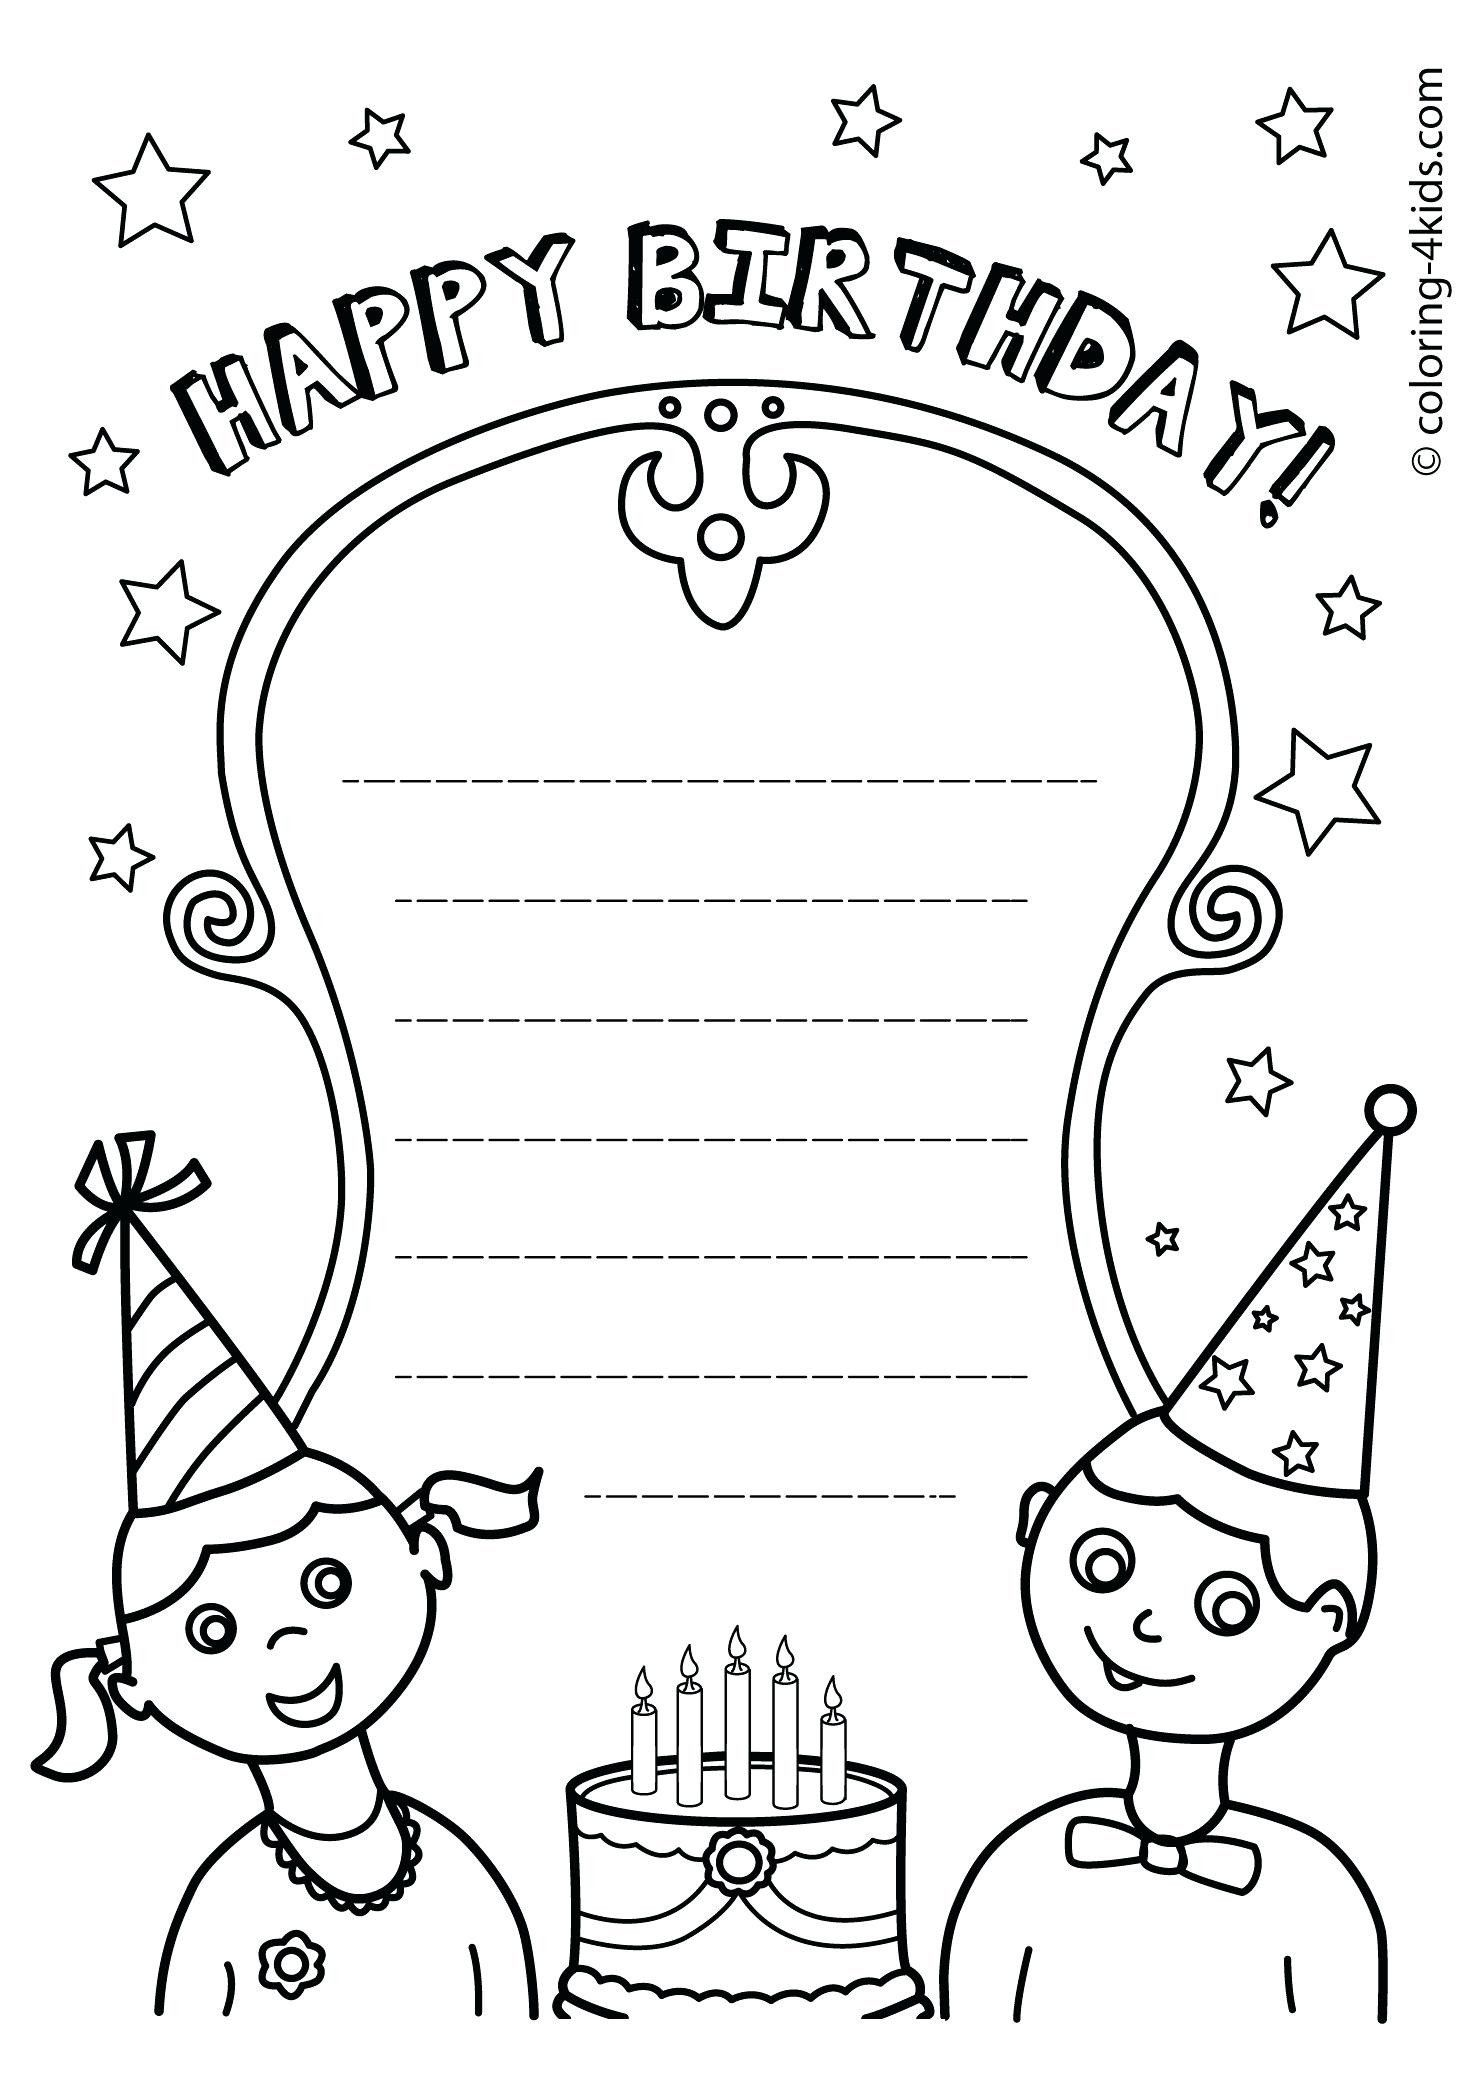 Happy Birthday Coloring Card Beautiful Happy Birthday Card Coloring Template N Happy Birthday Coloring Pages Coloring Birthday Cards Happy Birthday Printable